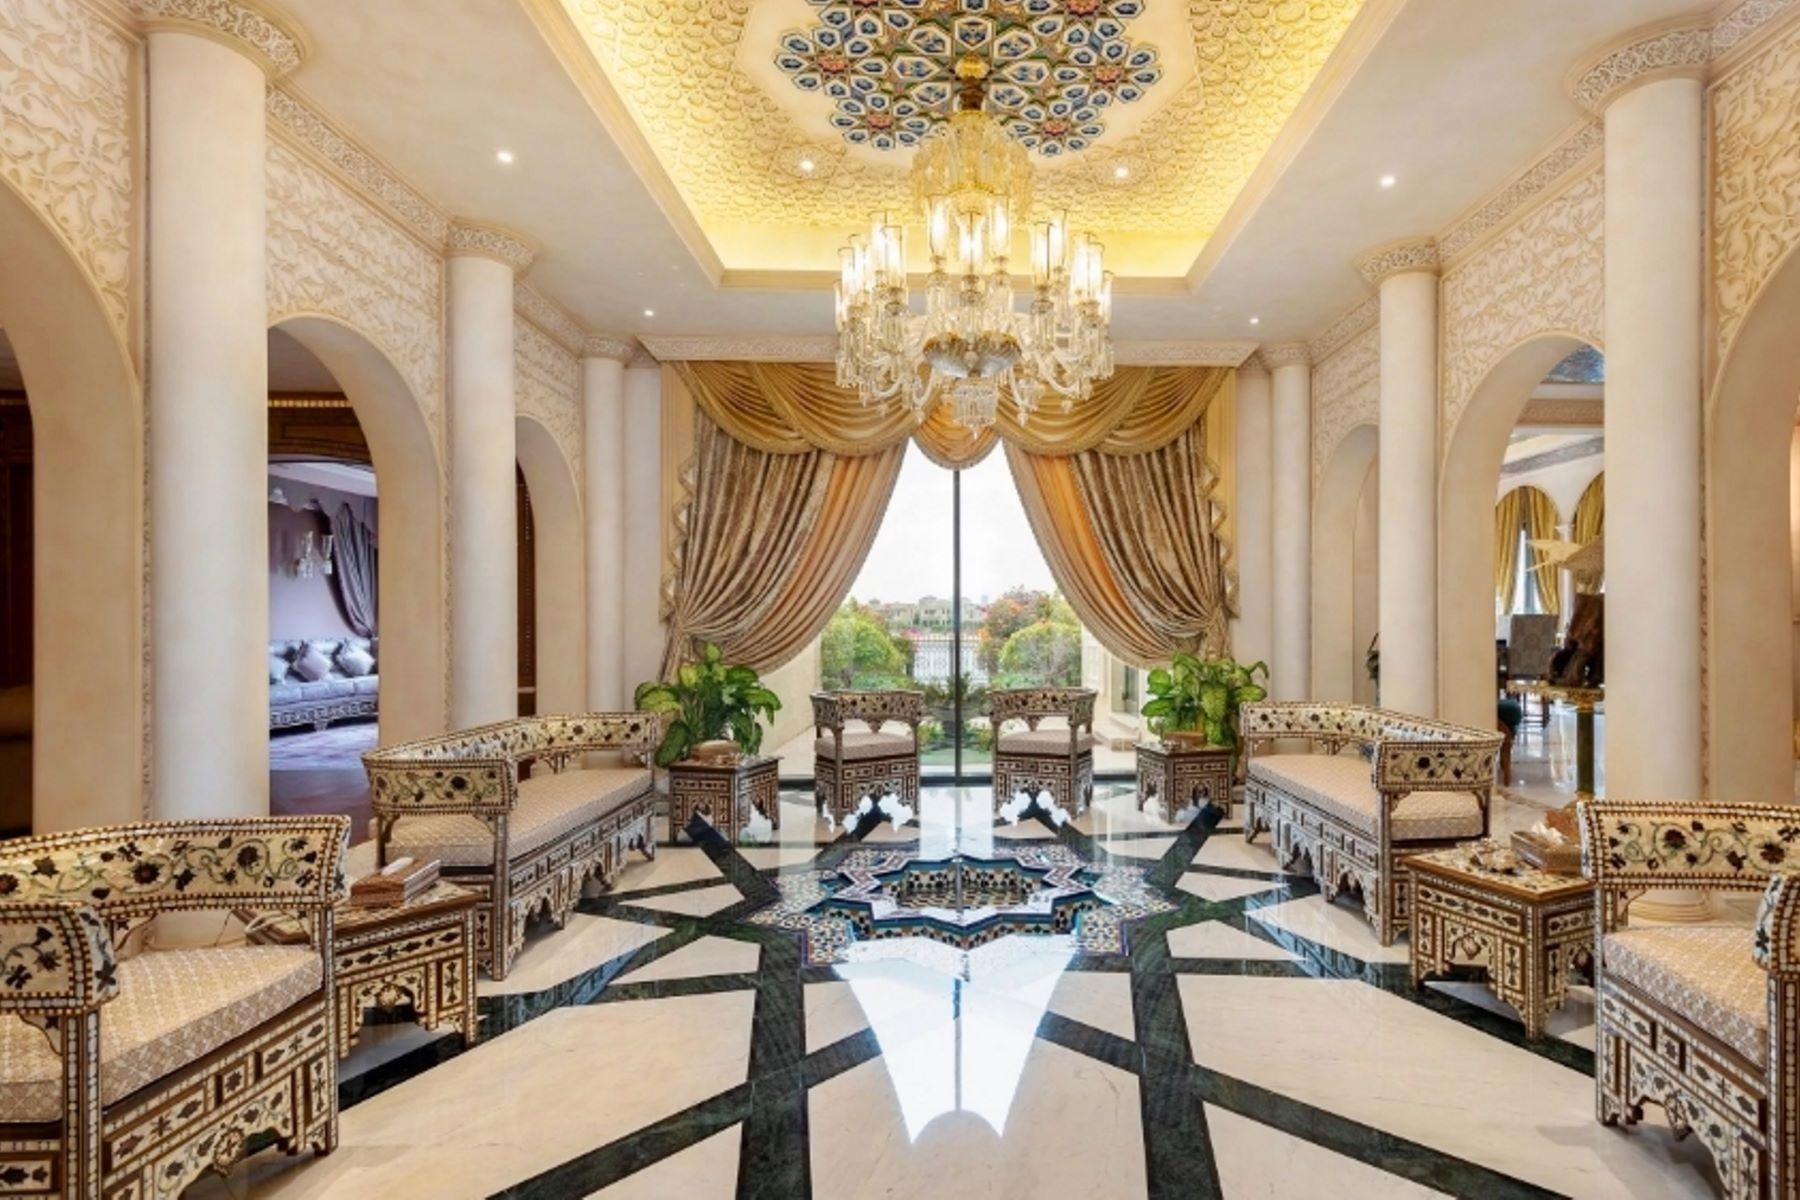 Single Family Homes for Sale at Renovated 6BR Beachfront Villa Other Dubai, Dubai United Arab Emirates